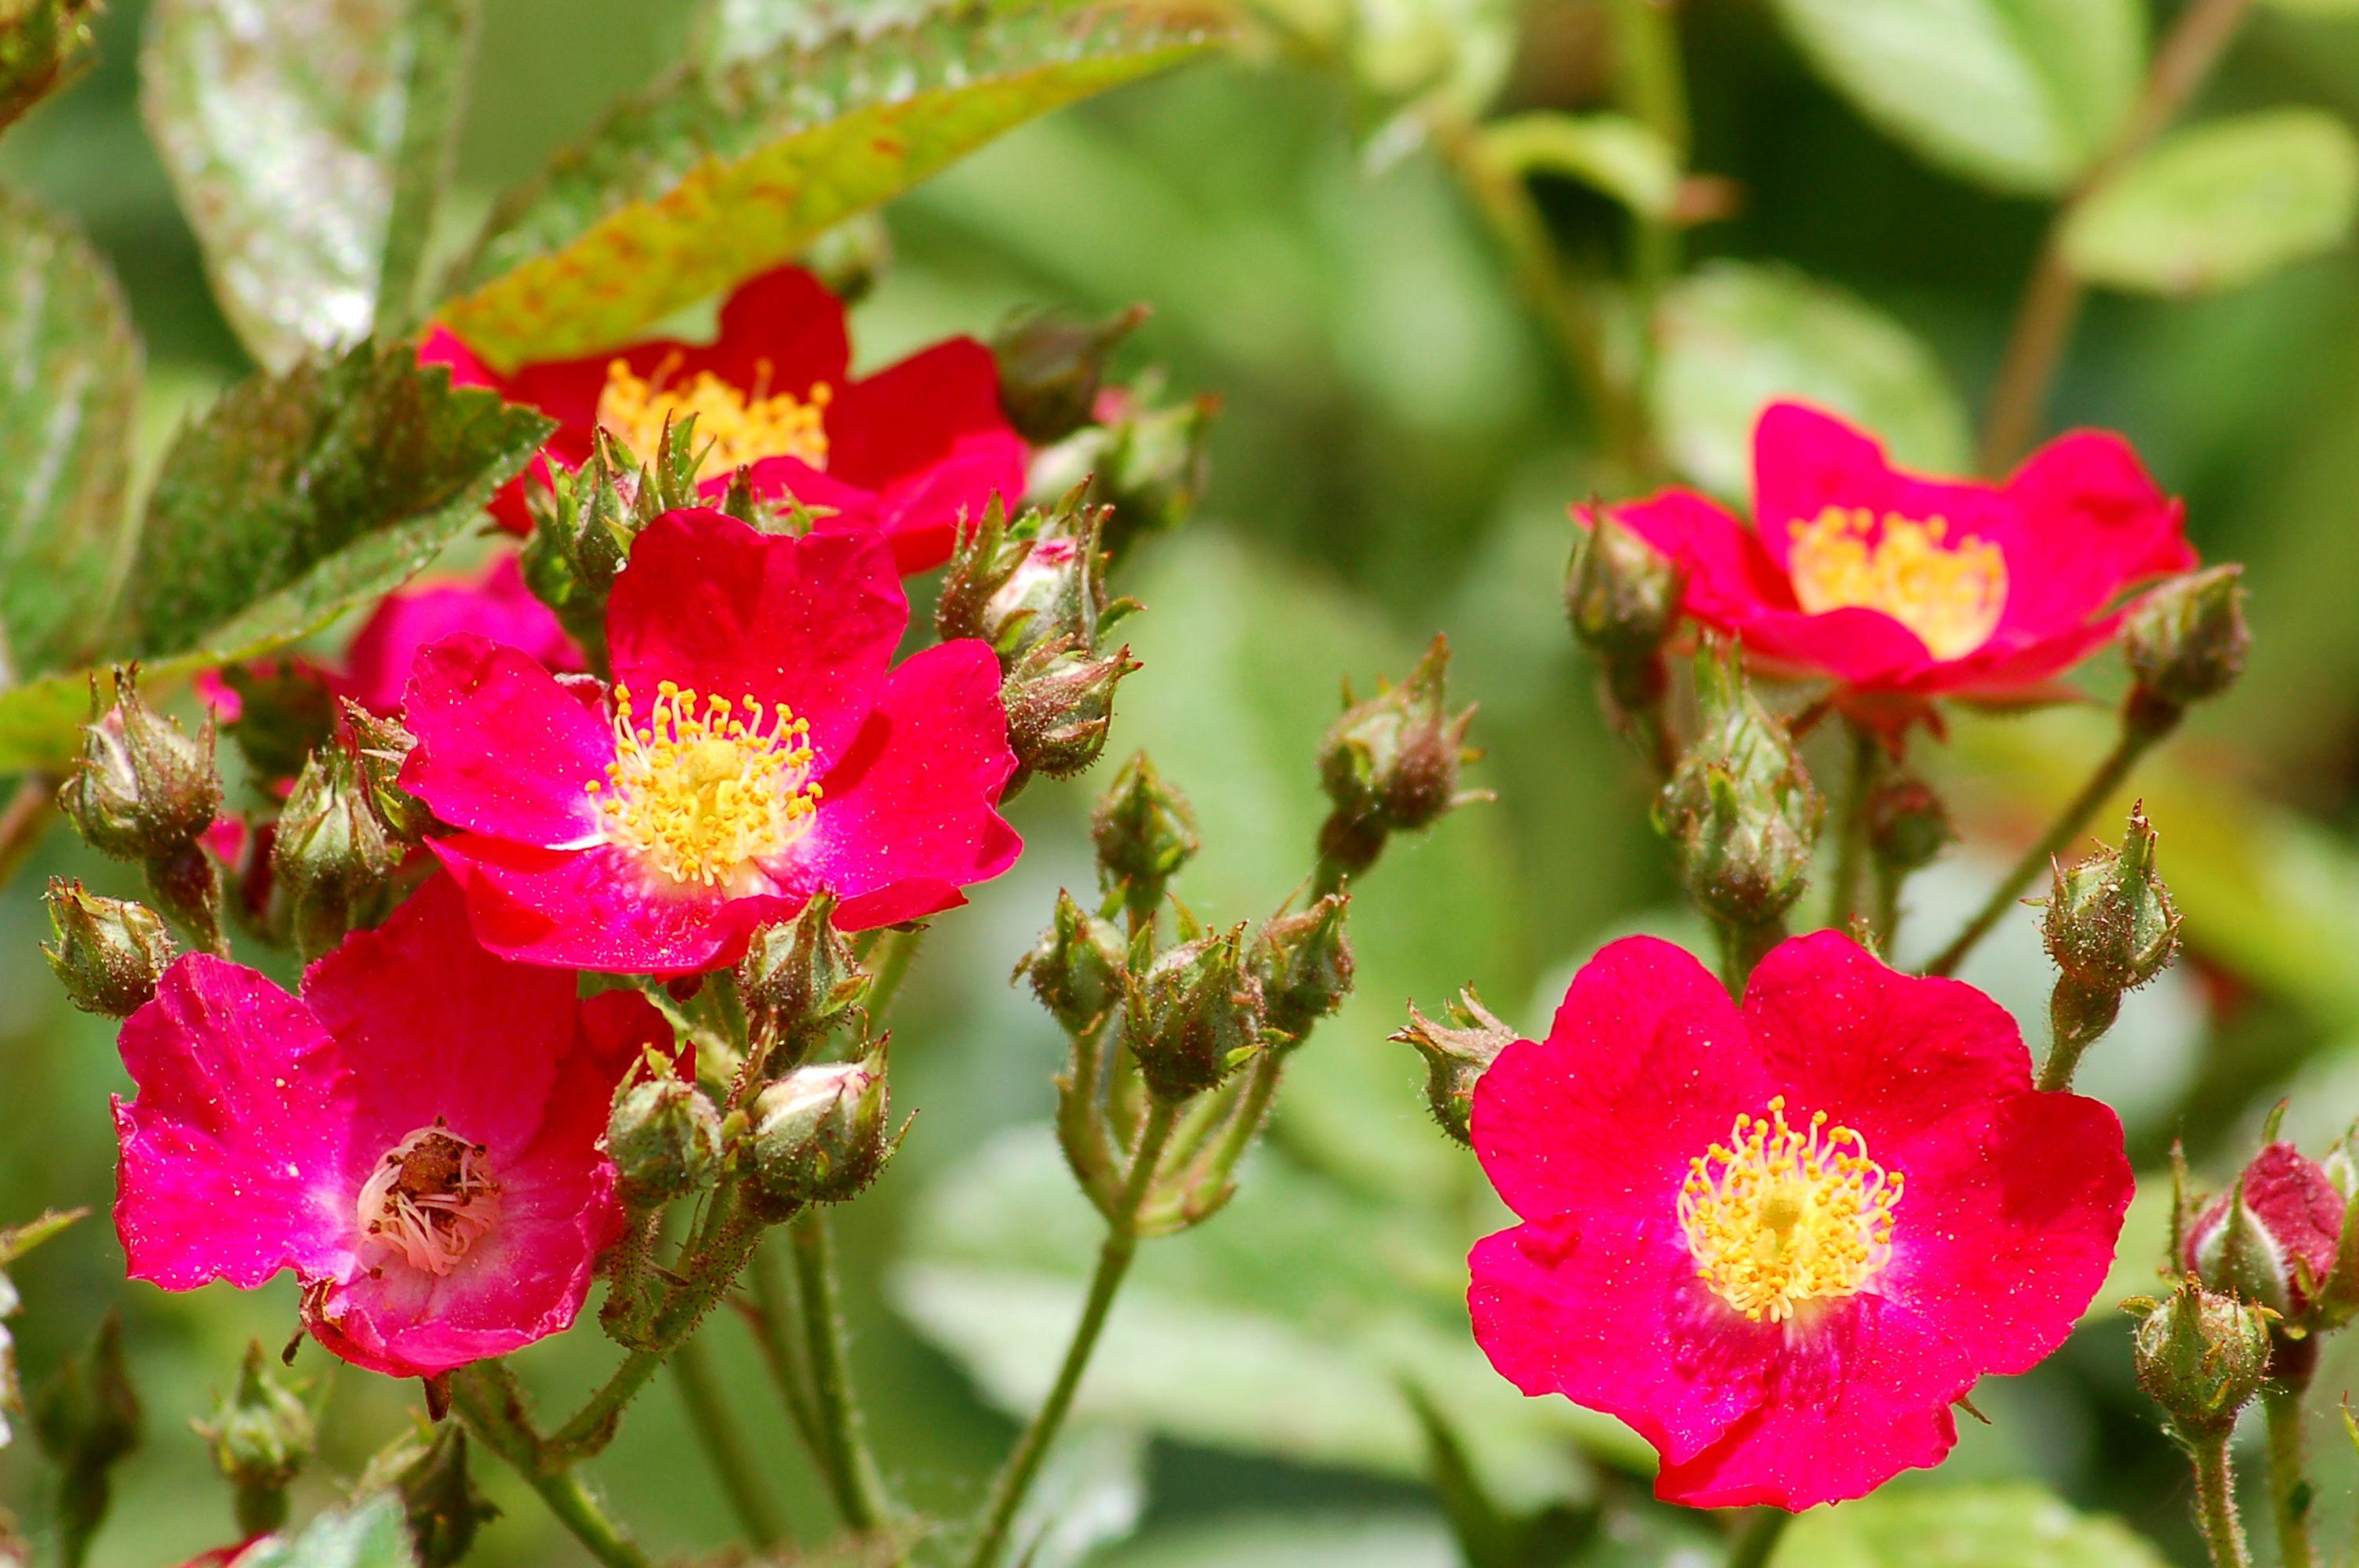 Drawn rose bush rose blossom Late of Rose Best for